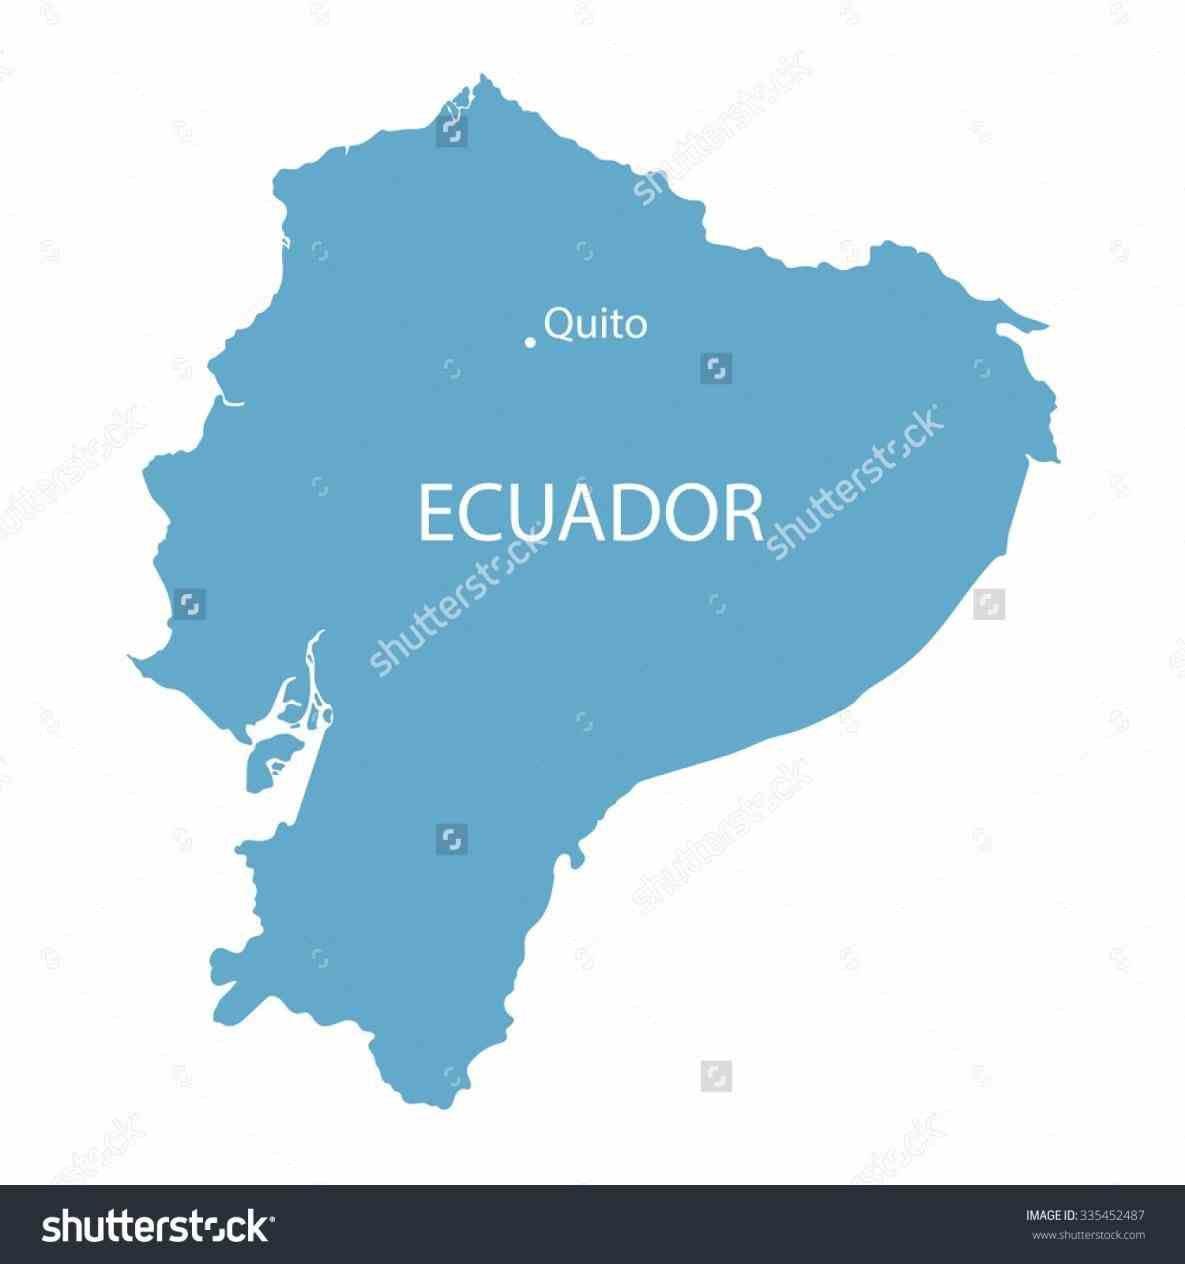 Quito Ecuador Map And Colombia Faults Hint Where Large Earthquakes - Map of ecuador world